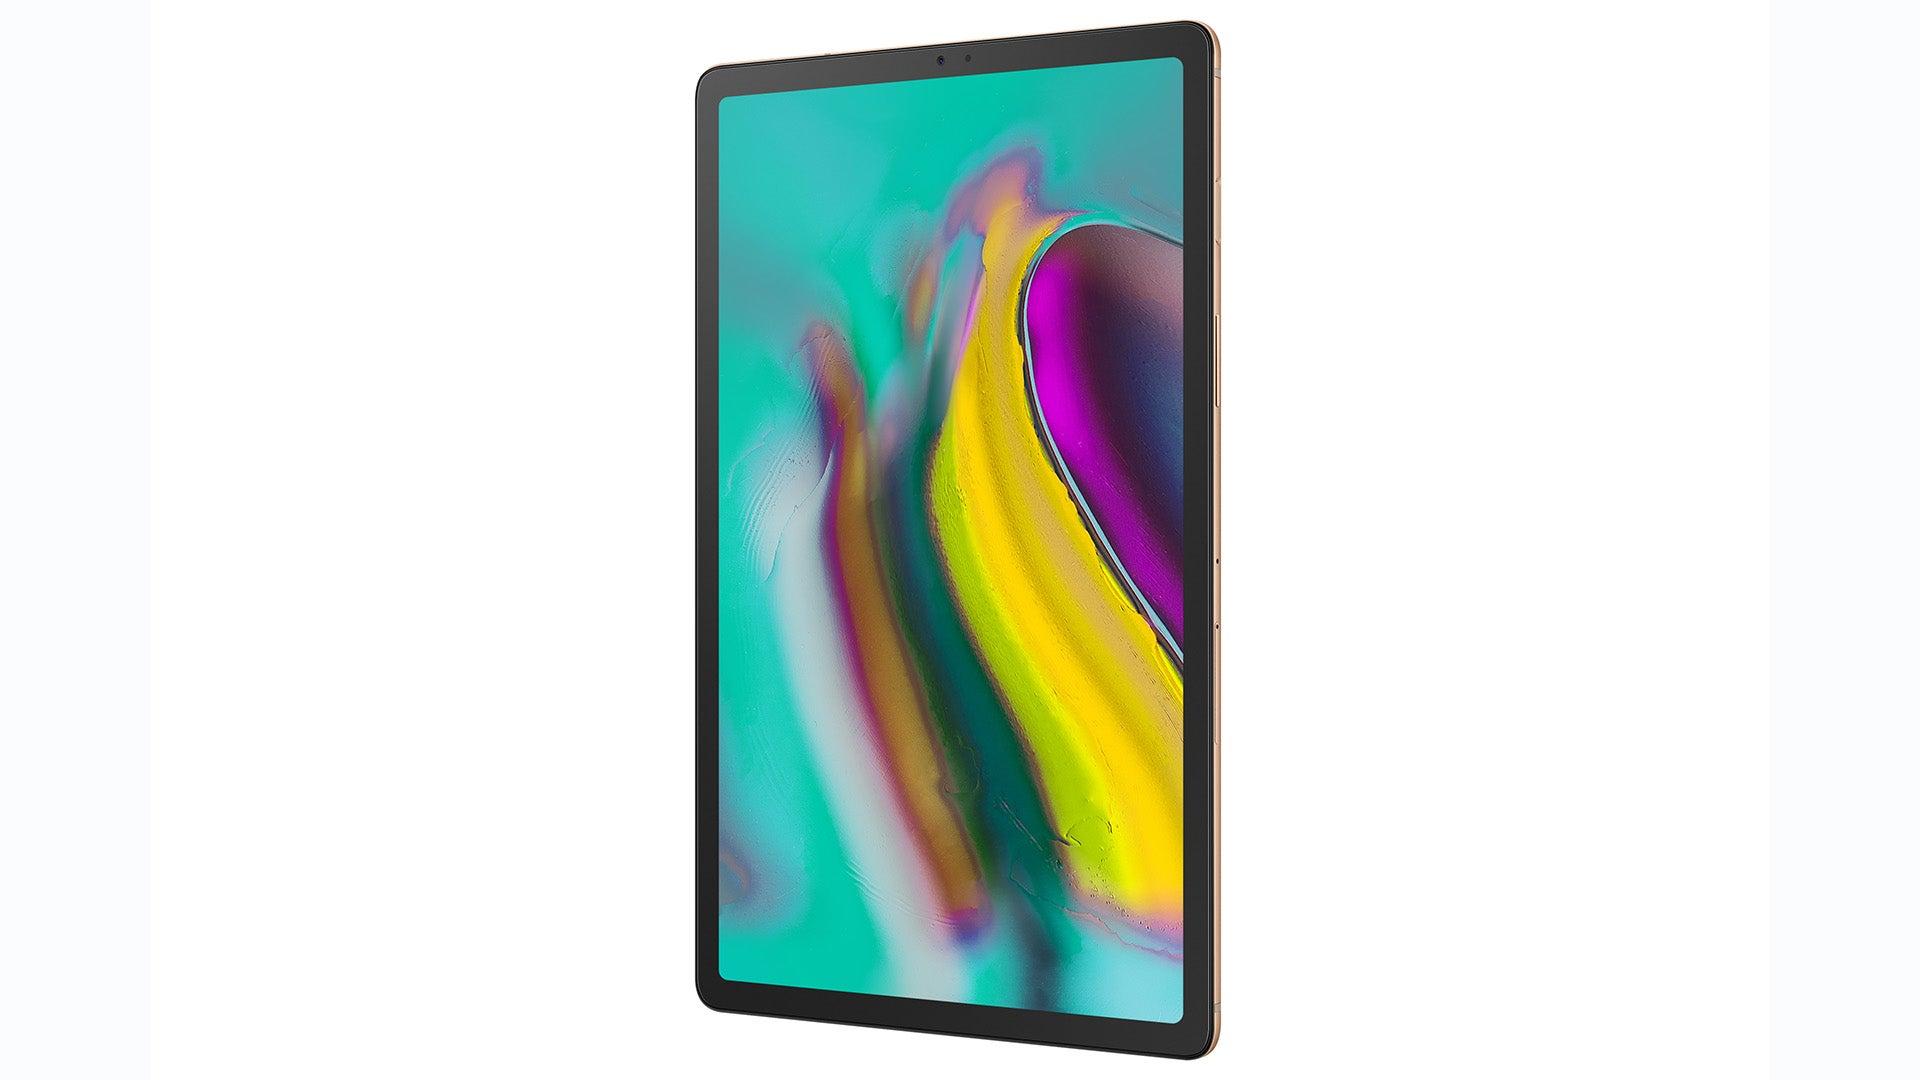 android dex galaxy-tab galaxy-tab-5se samsung-galaxy-tab-s5e tablets